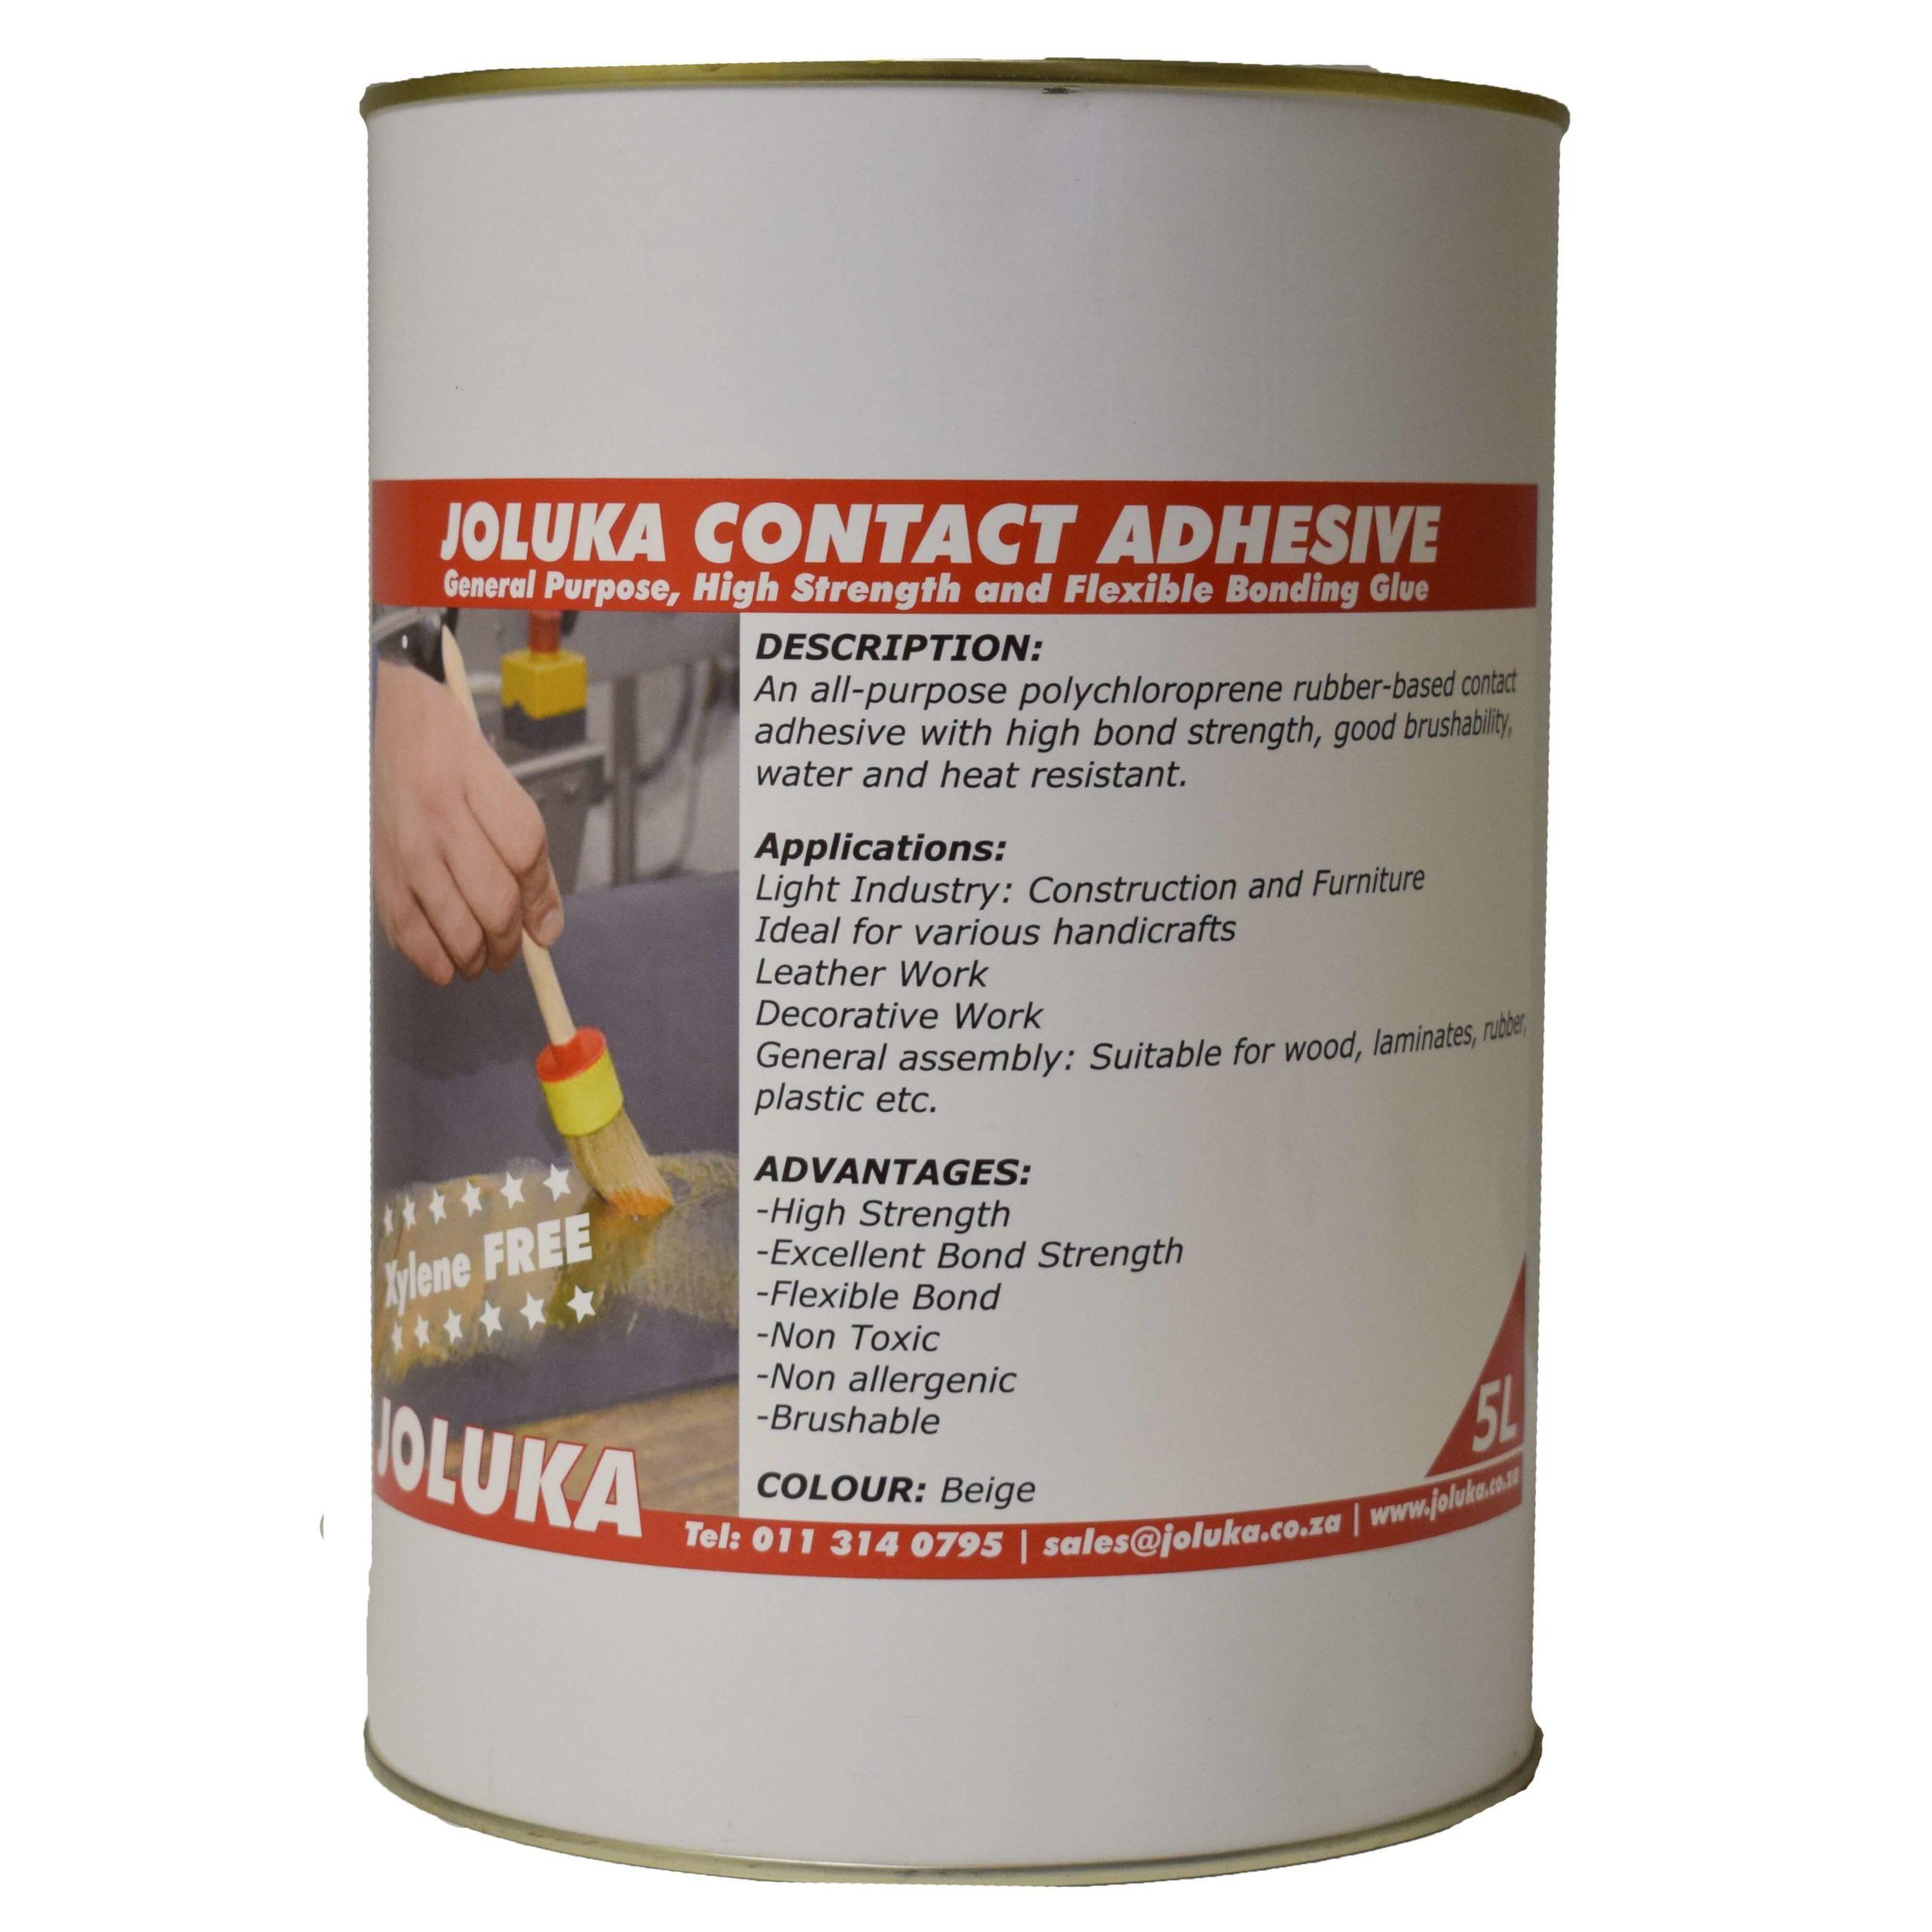 Joluka Contact Adhesive